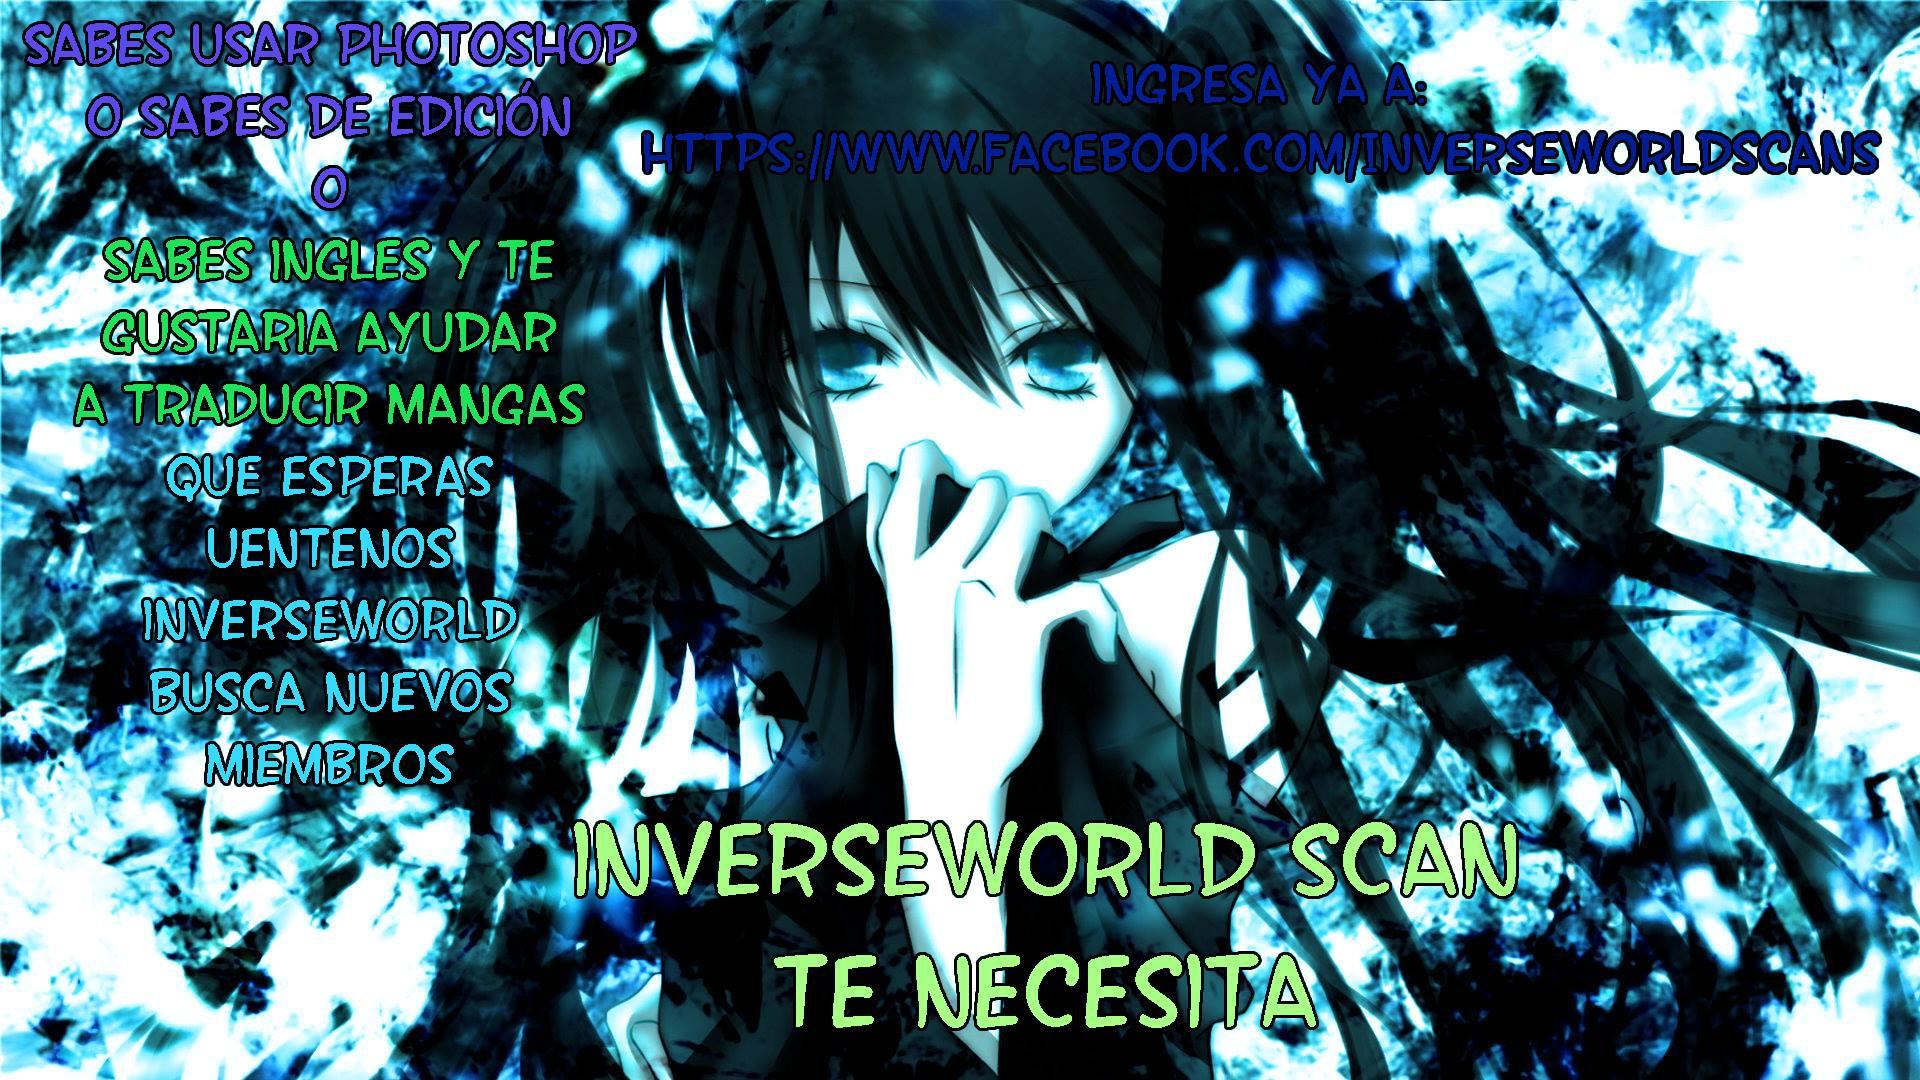 http://c5.ninemanga.com/es_manga/18/16210/415332/0992de7aa6a421ecf8abf57d98505485.jpg Page 1